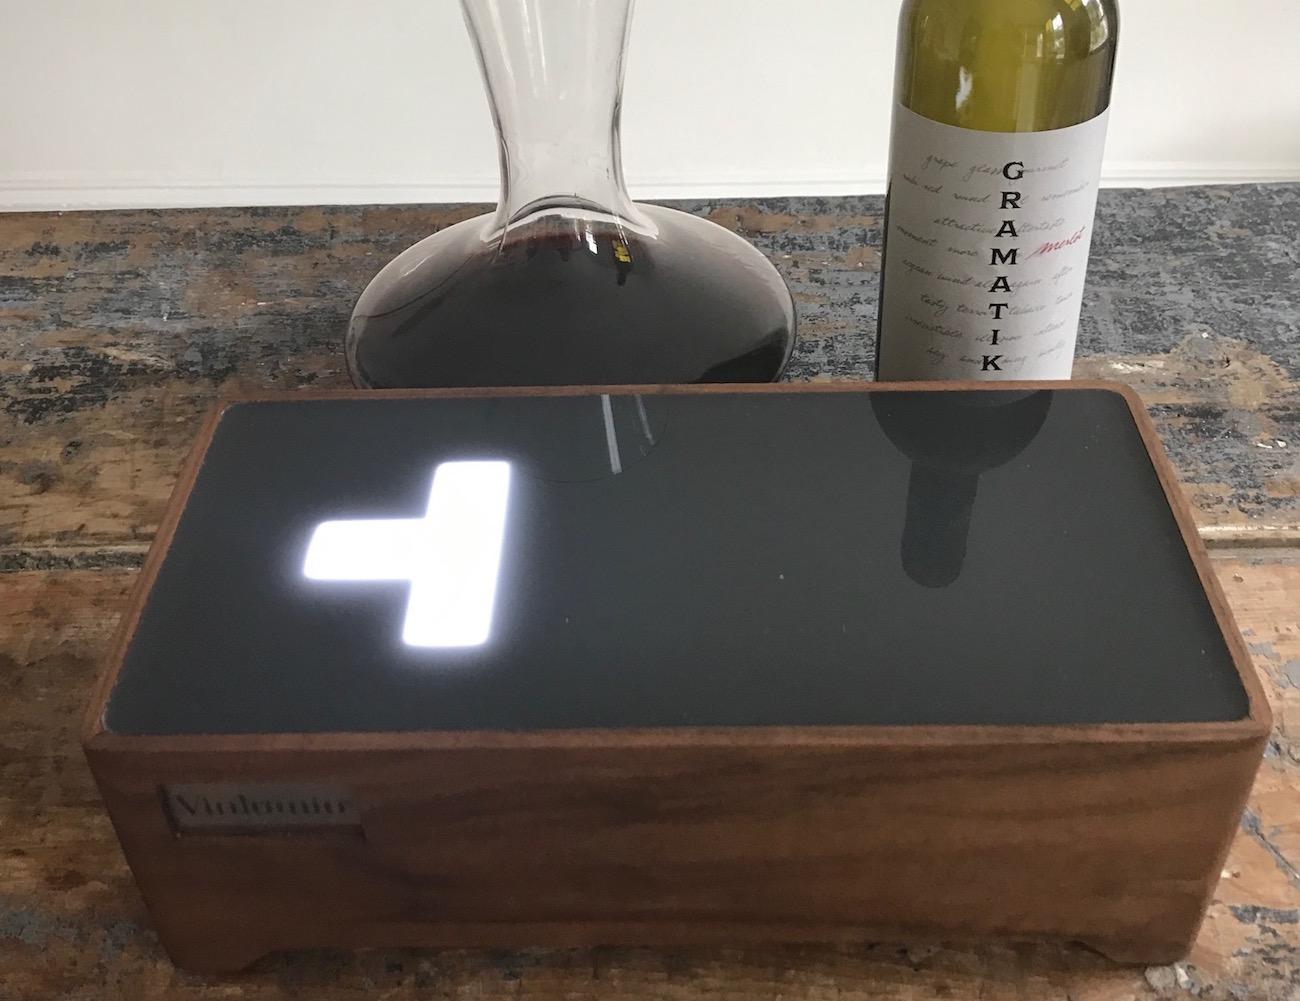 Vinlumin Wine Enhancing Light Box